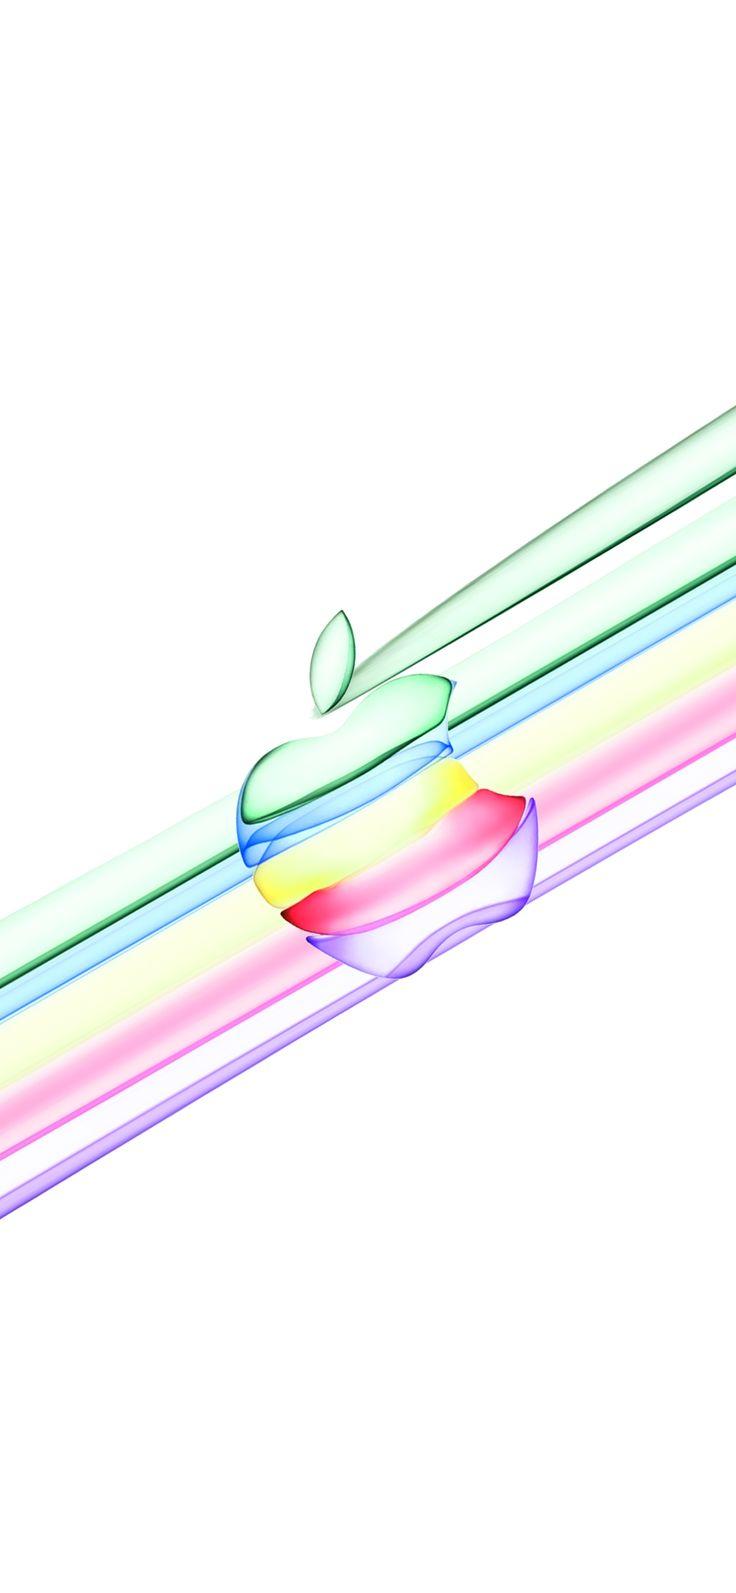 #iphonewallpaper #apple #applelogo #clearmode #ios13